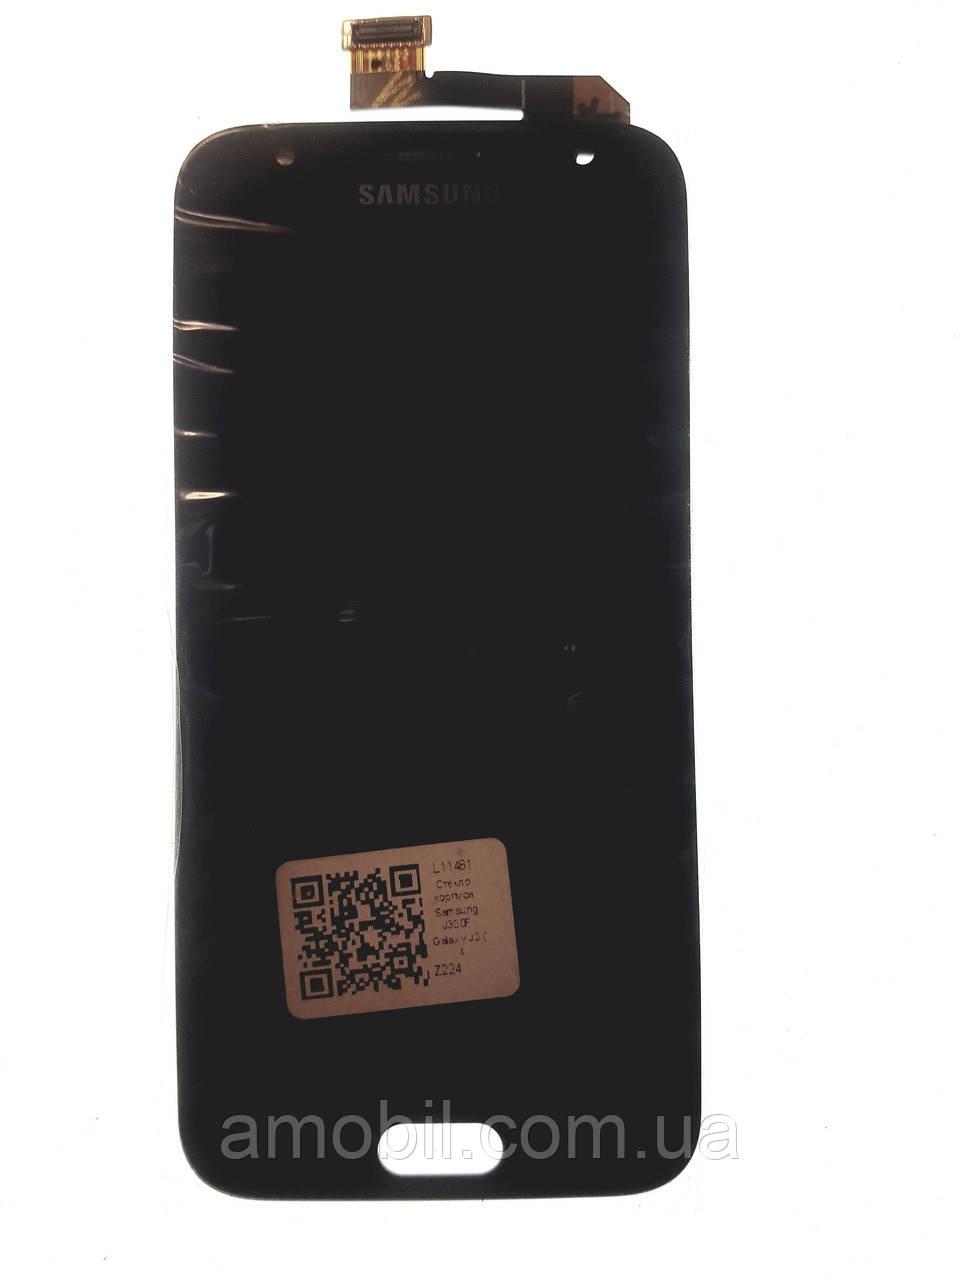 Дисплей Samsung J330F / J330G Galaxy J3 (2017) Black 100% orig (переклееное стекло)